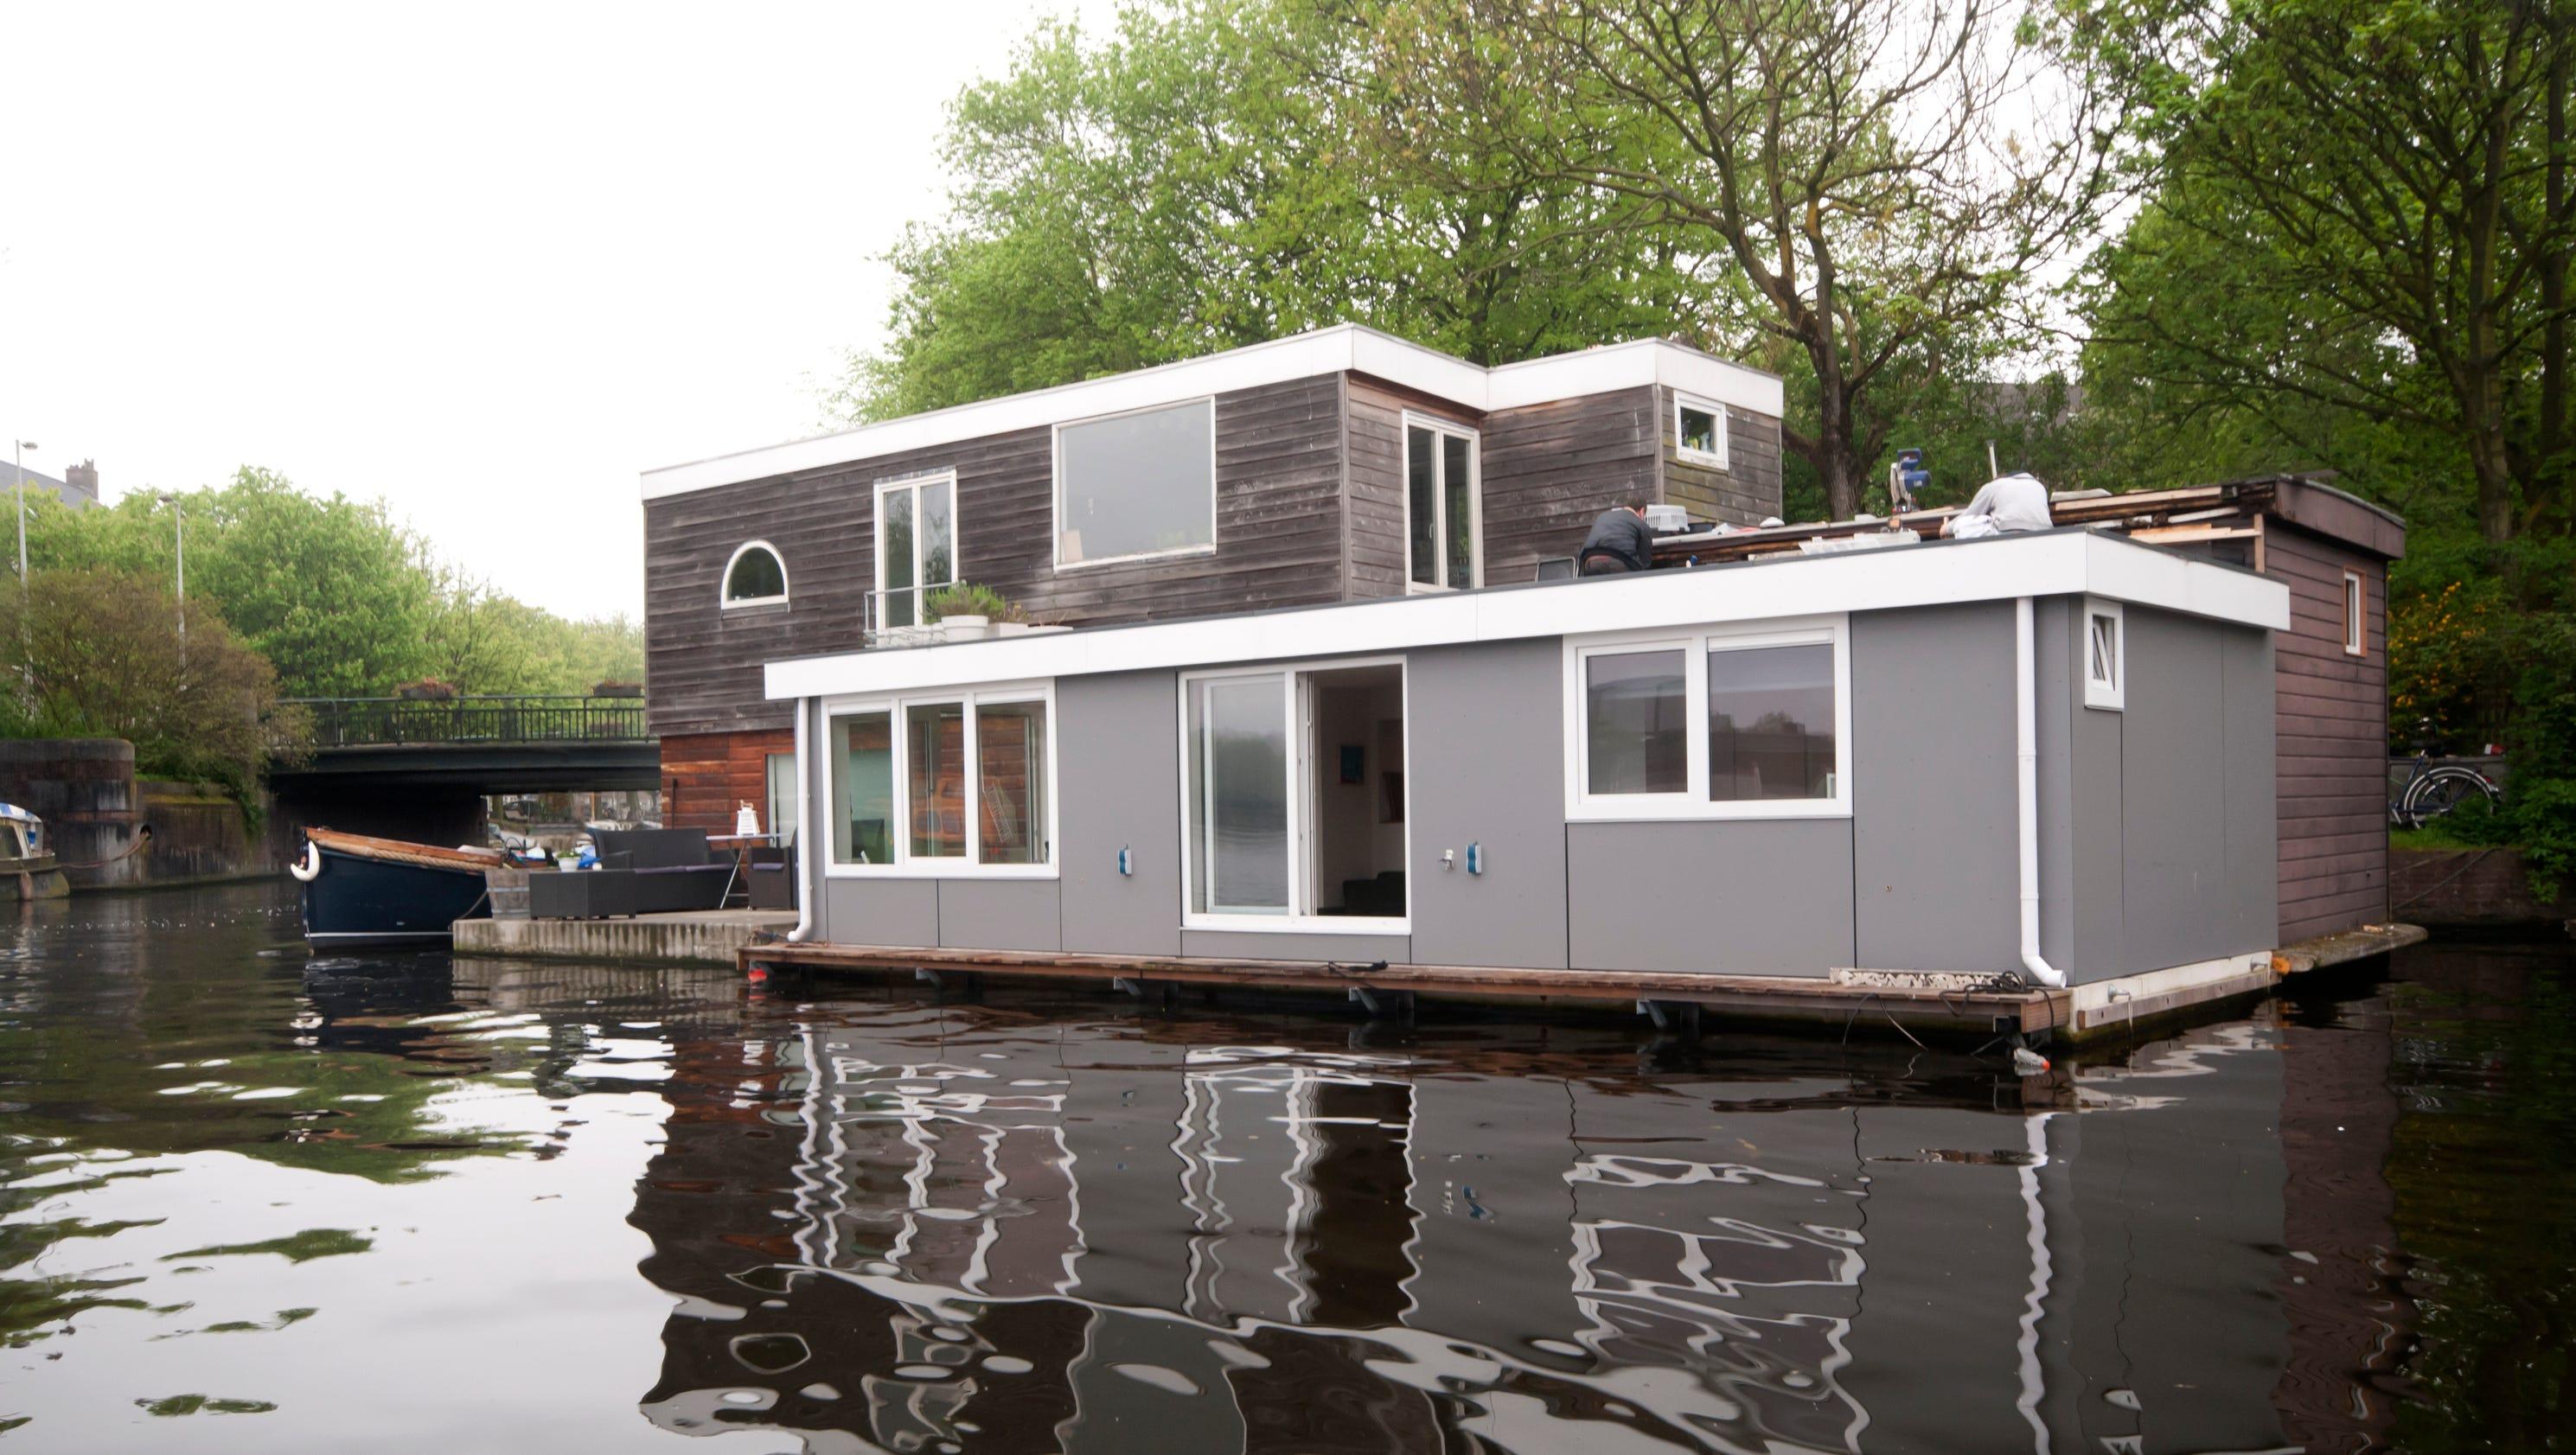 85375174 on Amsterdam Houseboat Rental